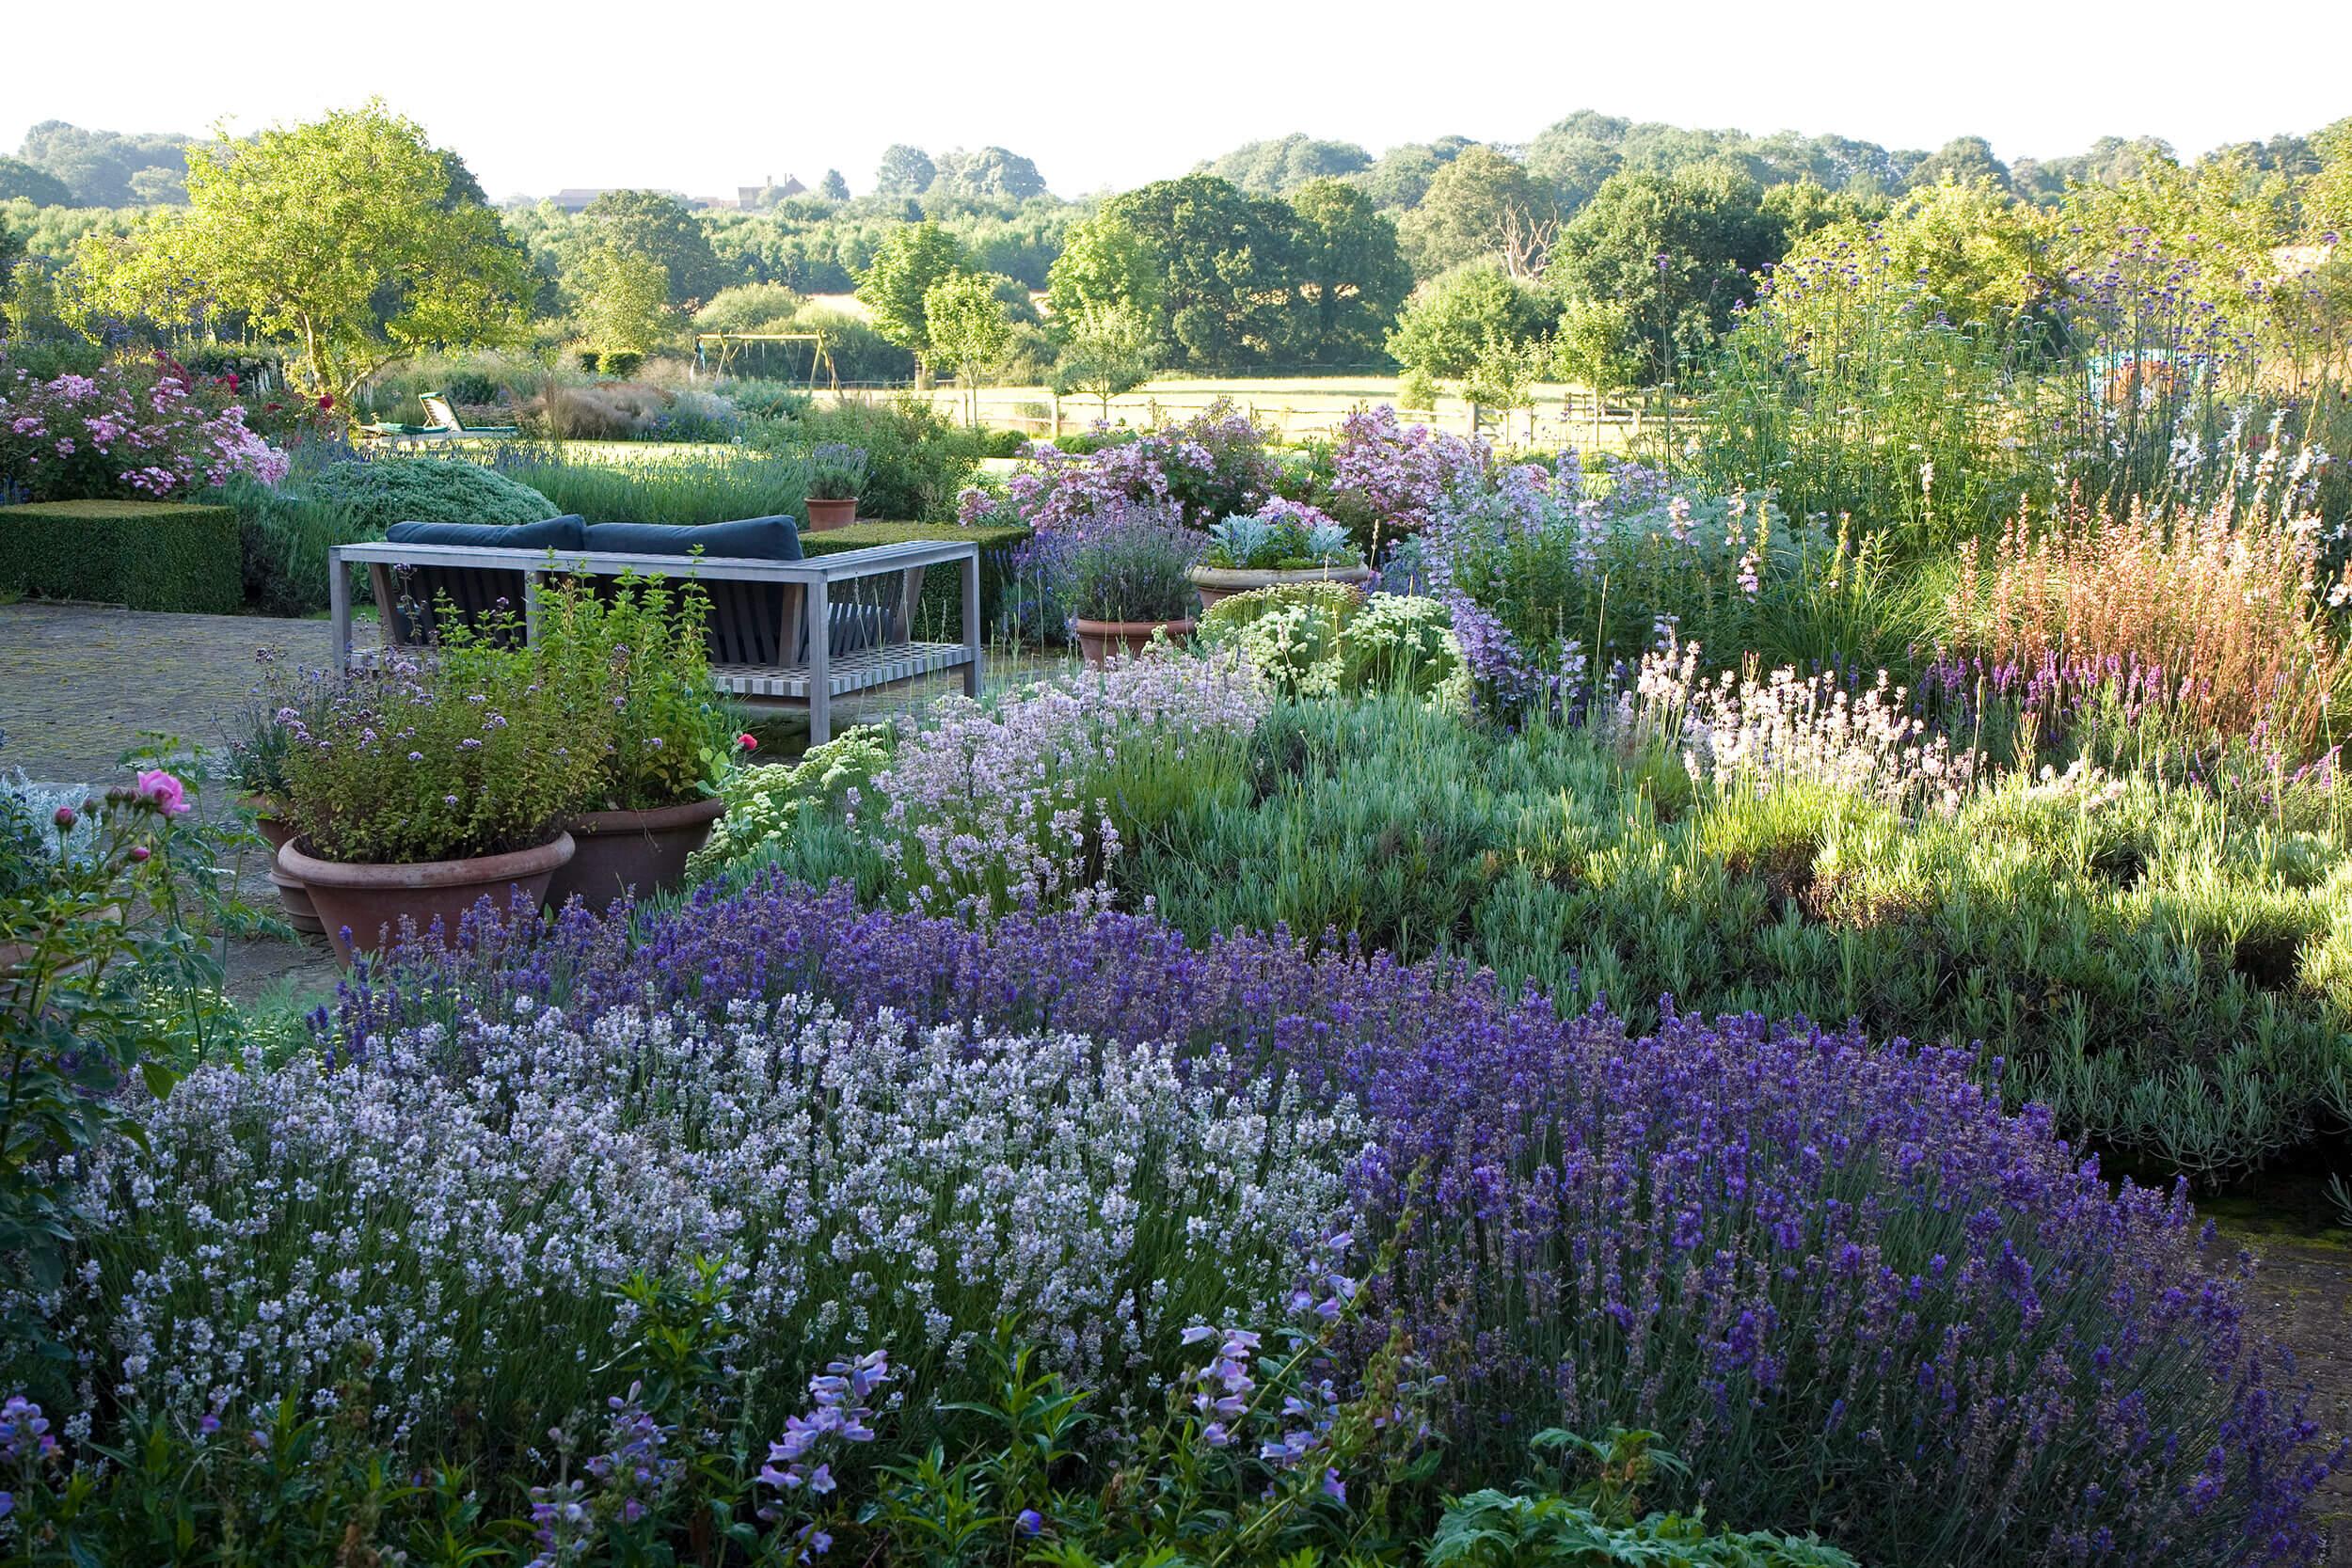 Garden in West Sussex